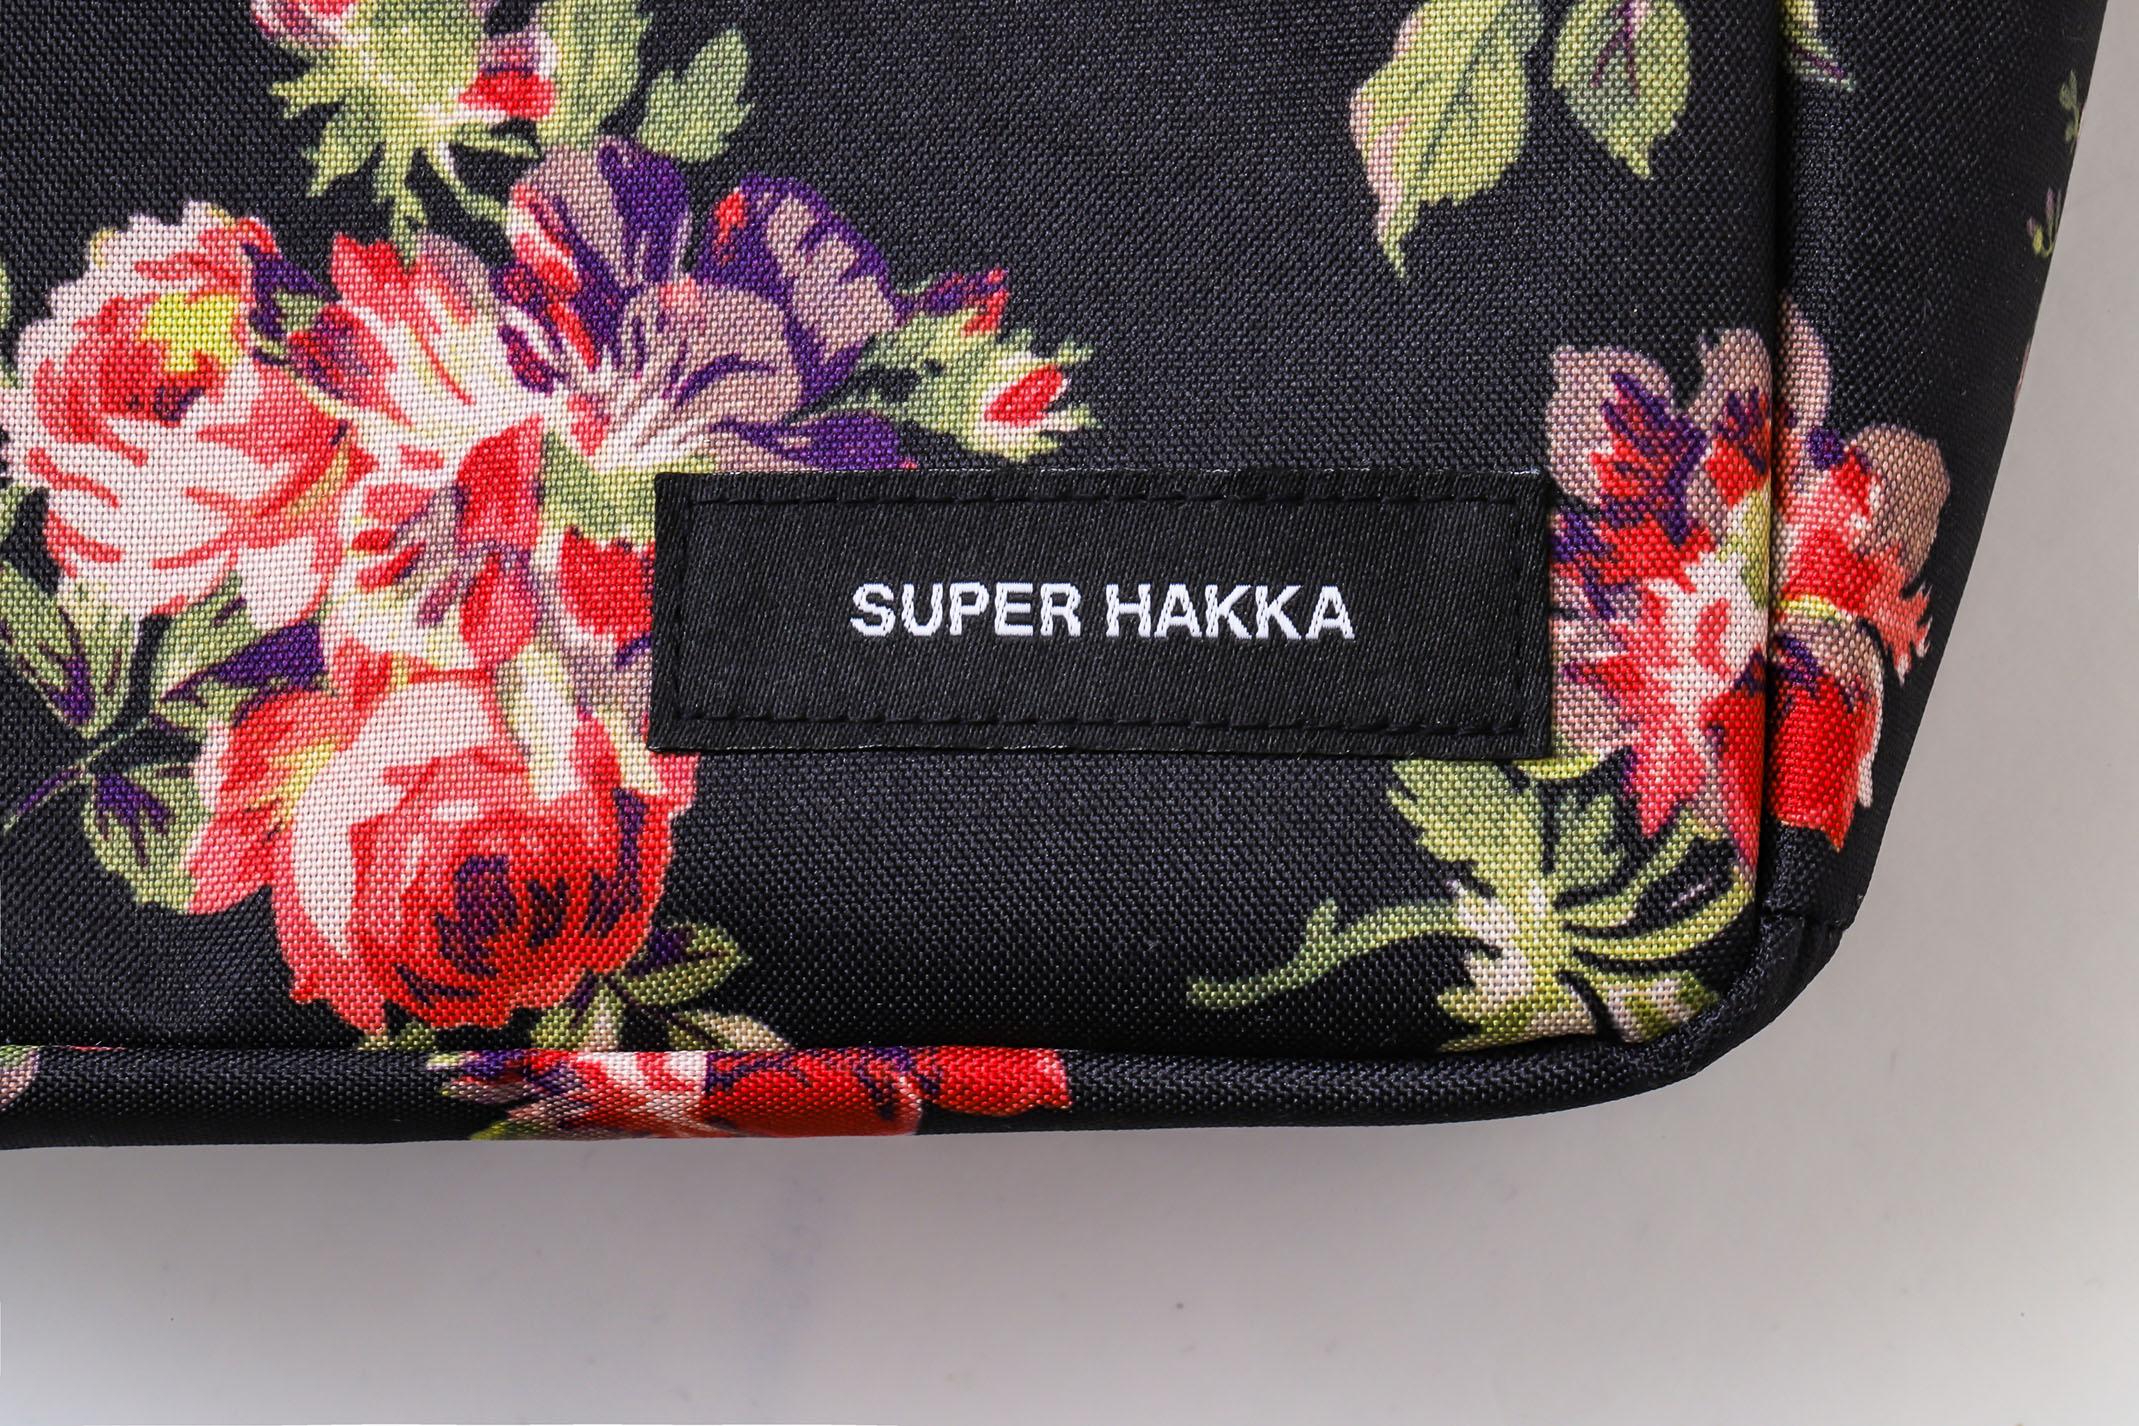 SUPER HAKKA_アンティークローズフラワー柄ショルダーバッグ08